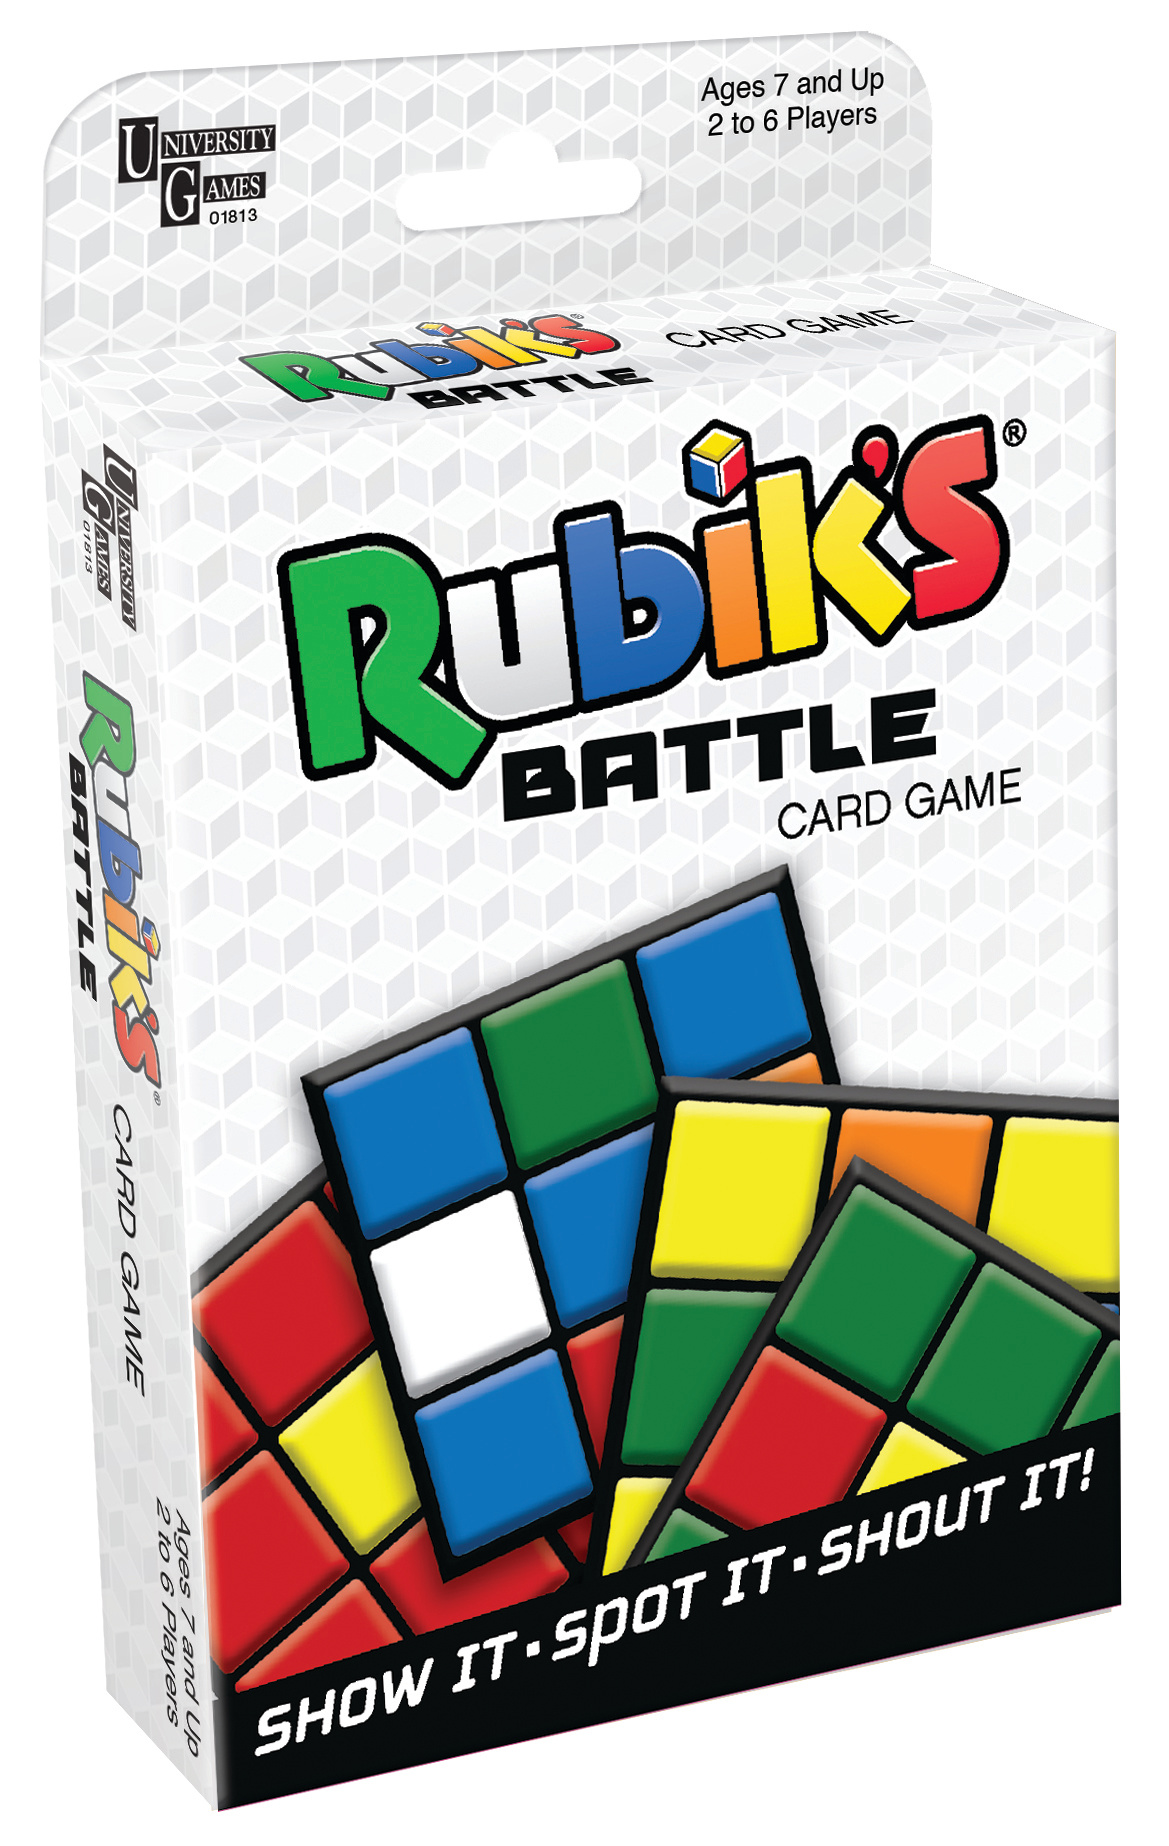 01813_RubiksCardGame_Final